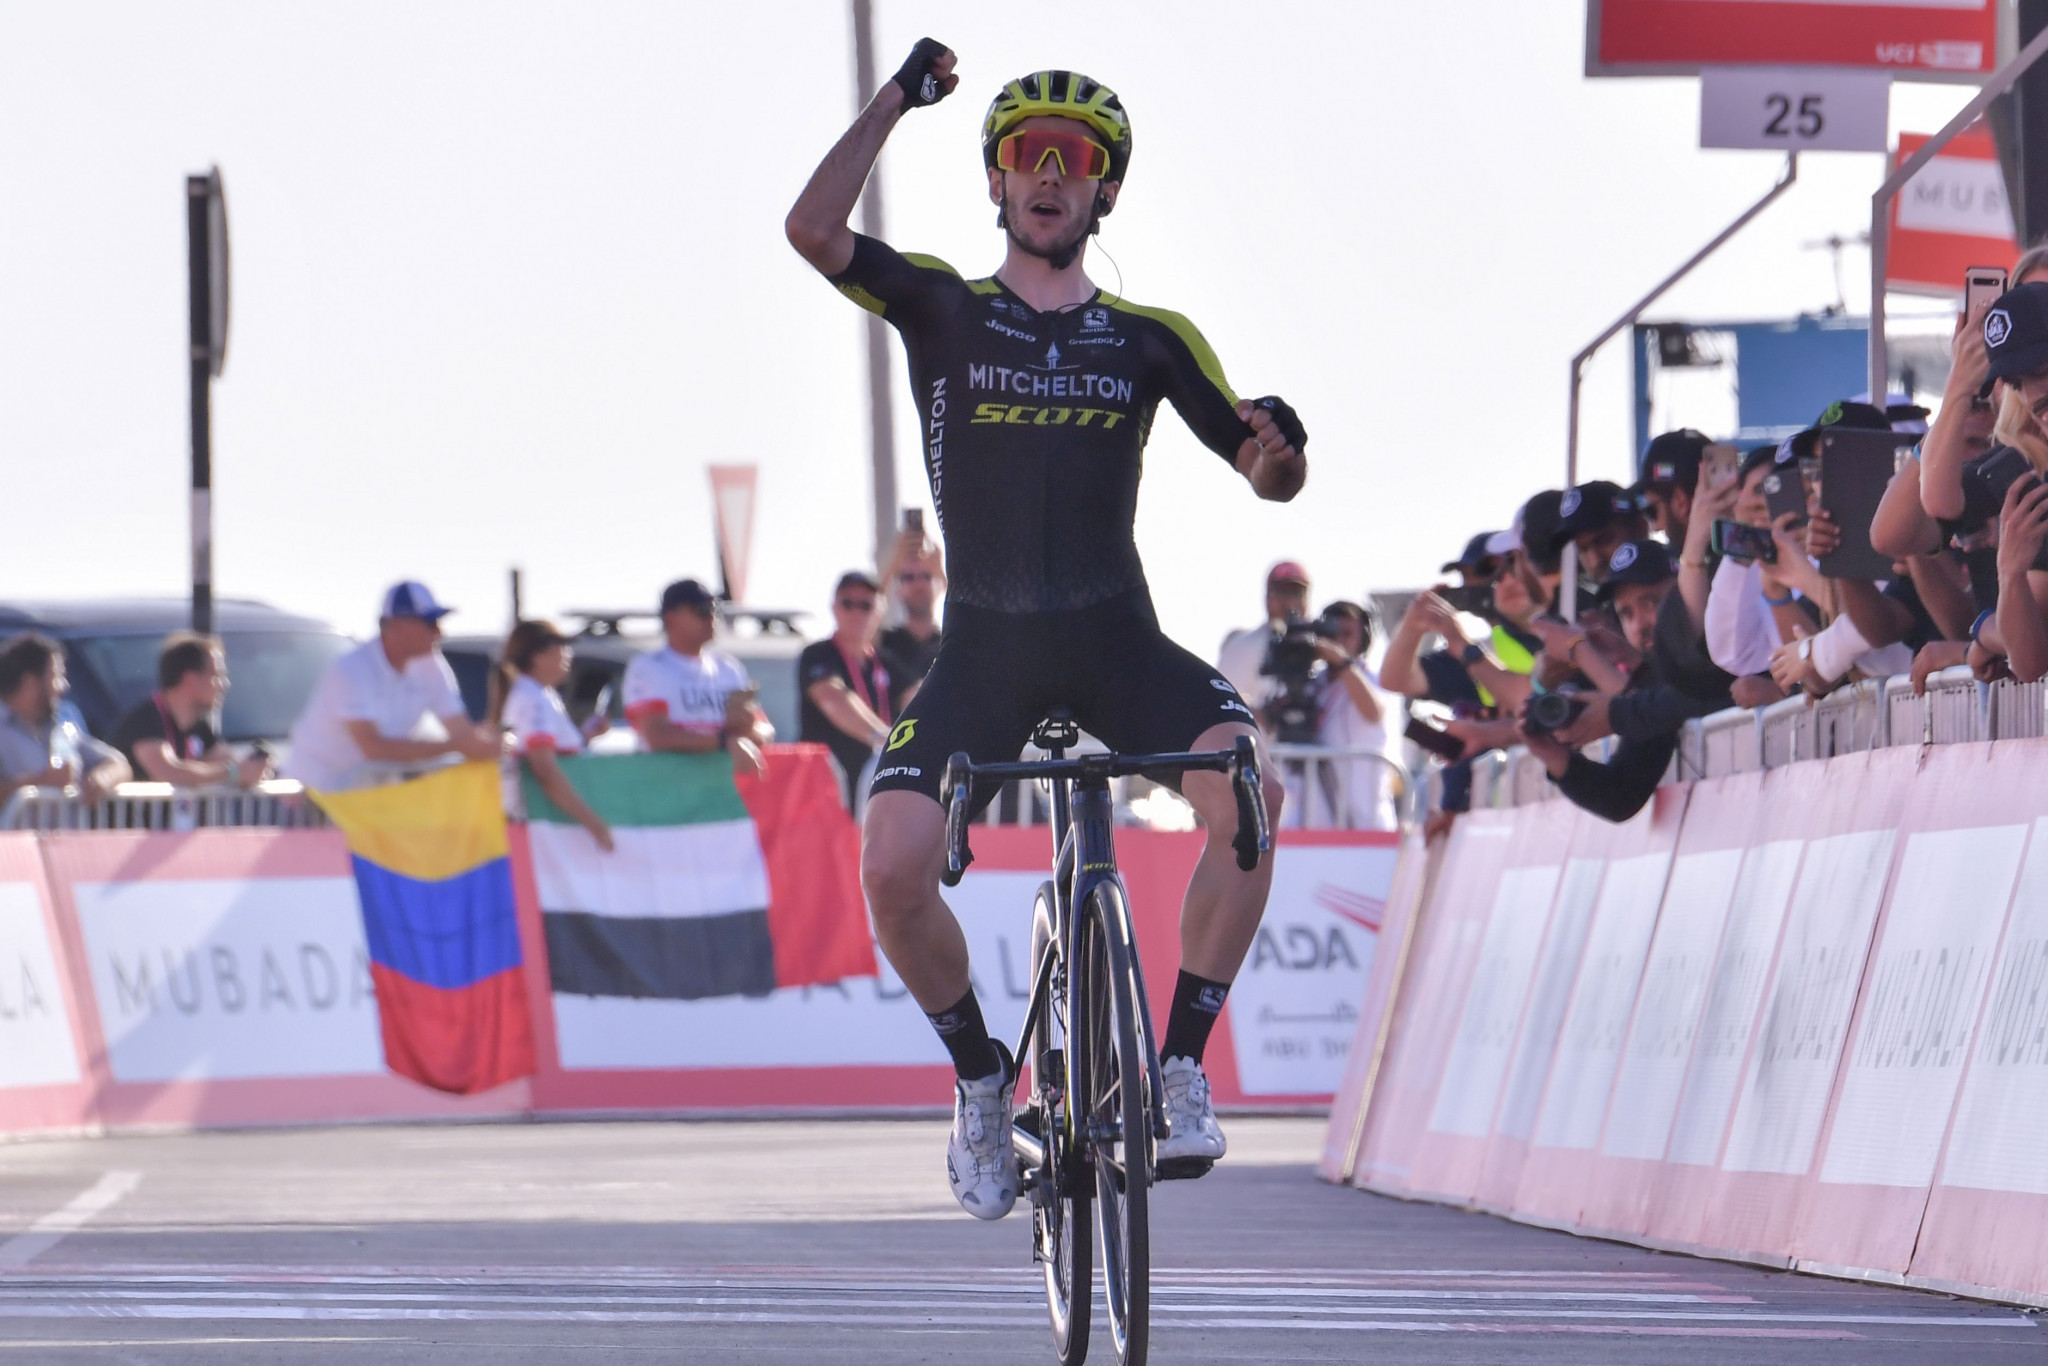 Yates wins third stage of UAE Tour to take race lead